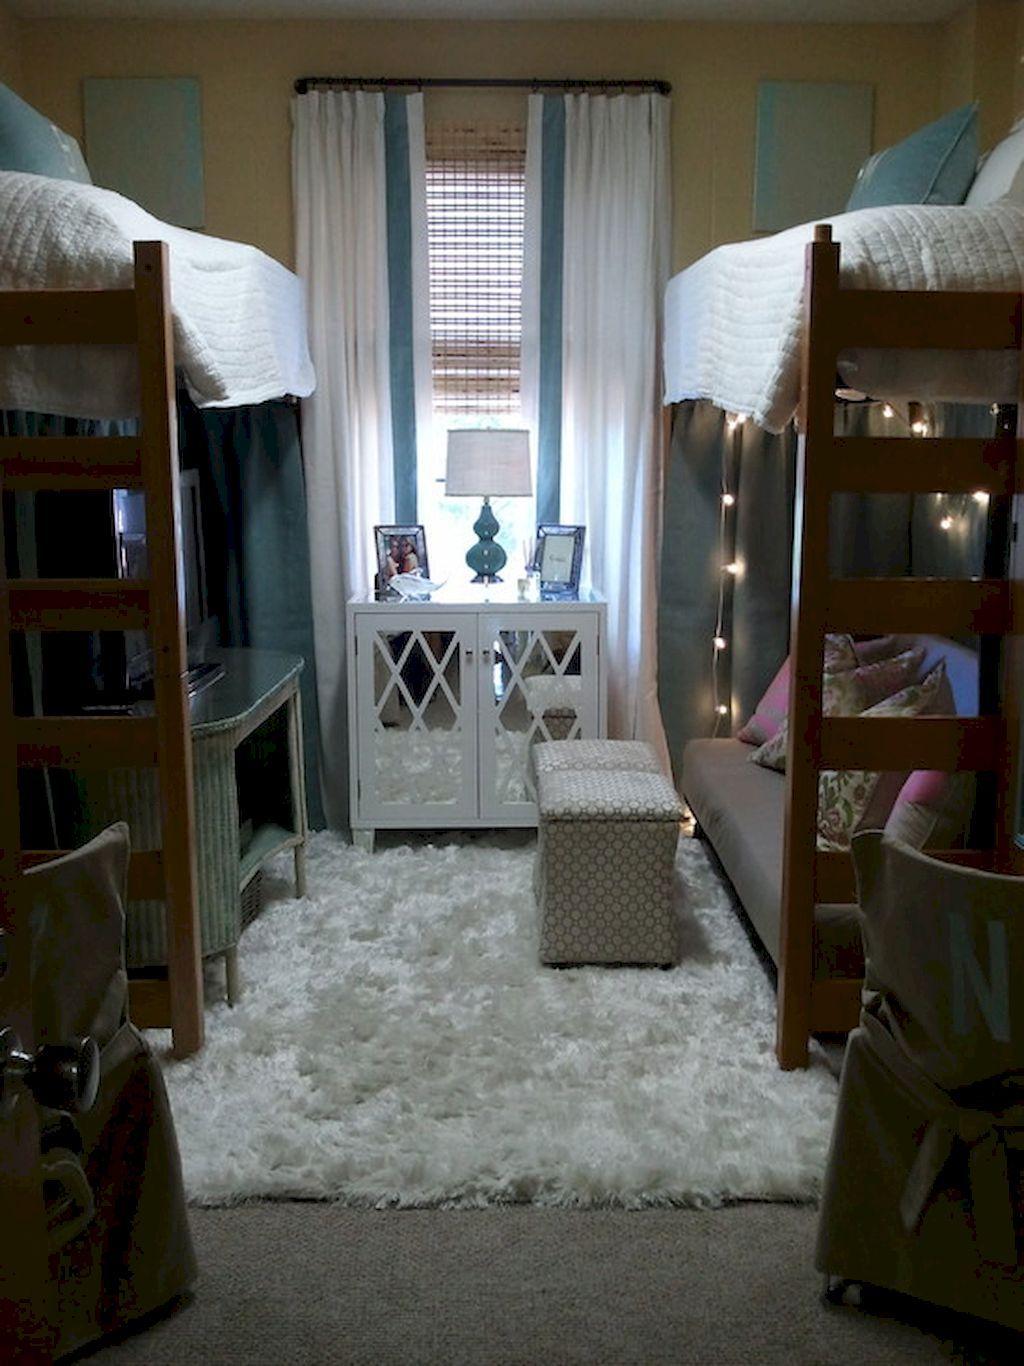 Loft bed ideas for dorm room   Cute Loft Beds College Dorm Room Design Ideas For Girl  Dorm